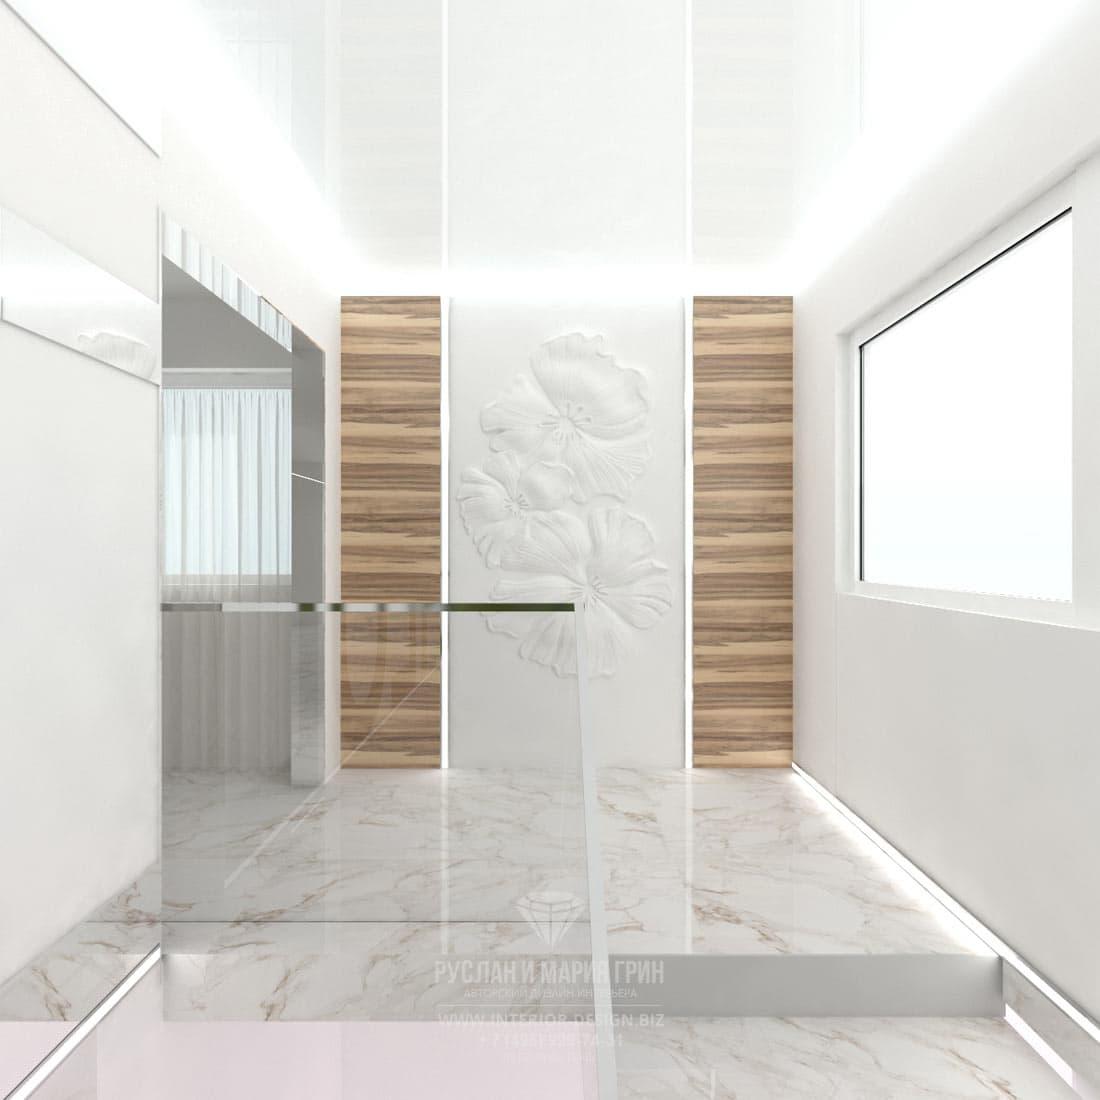 Дизайн интерьера современного салона красоты. Интерьер лестницы